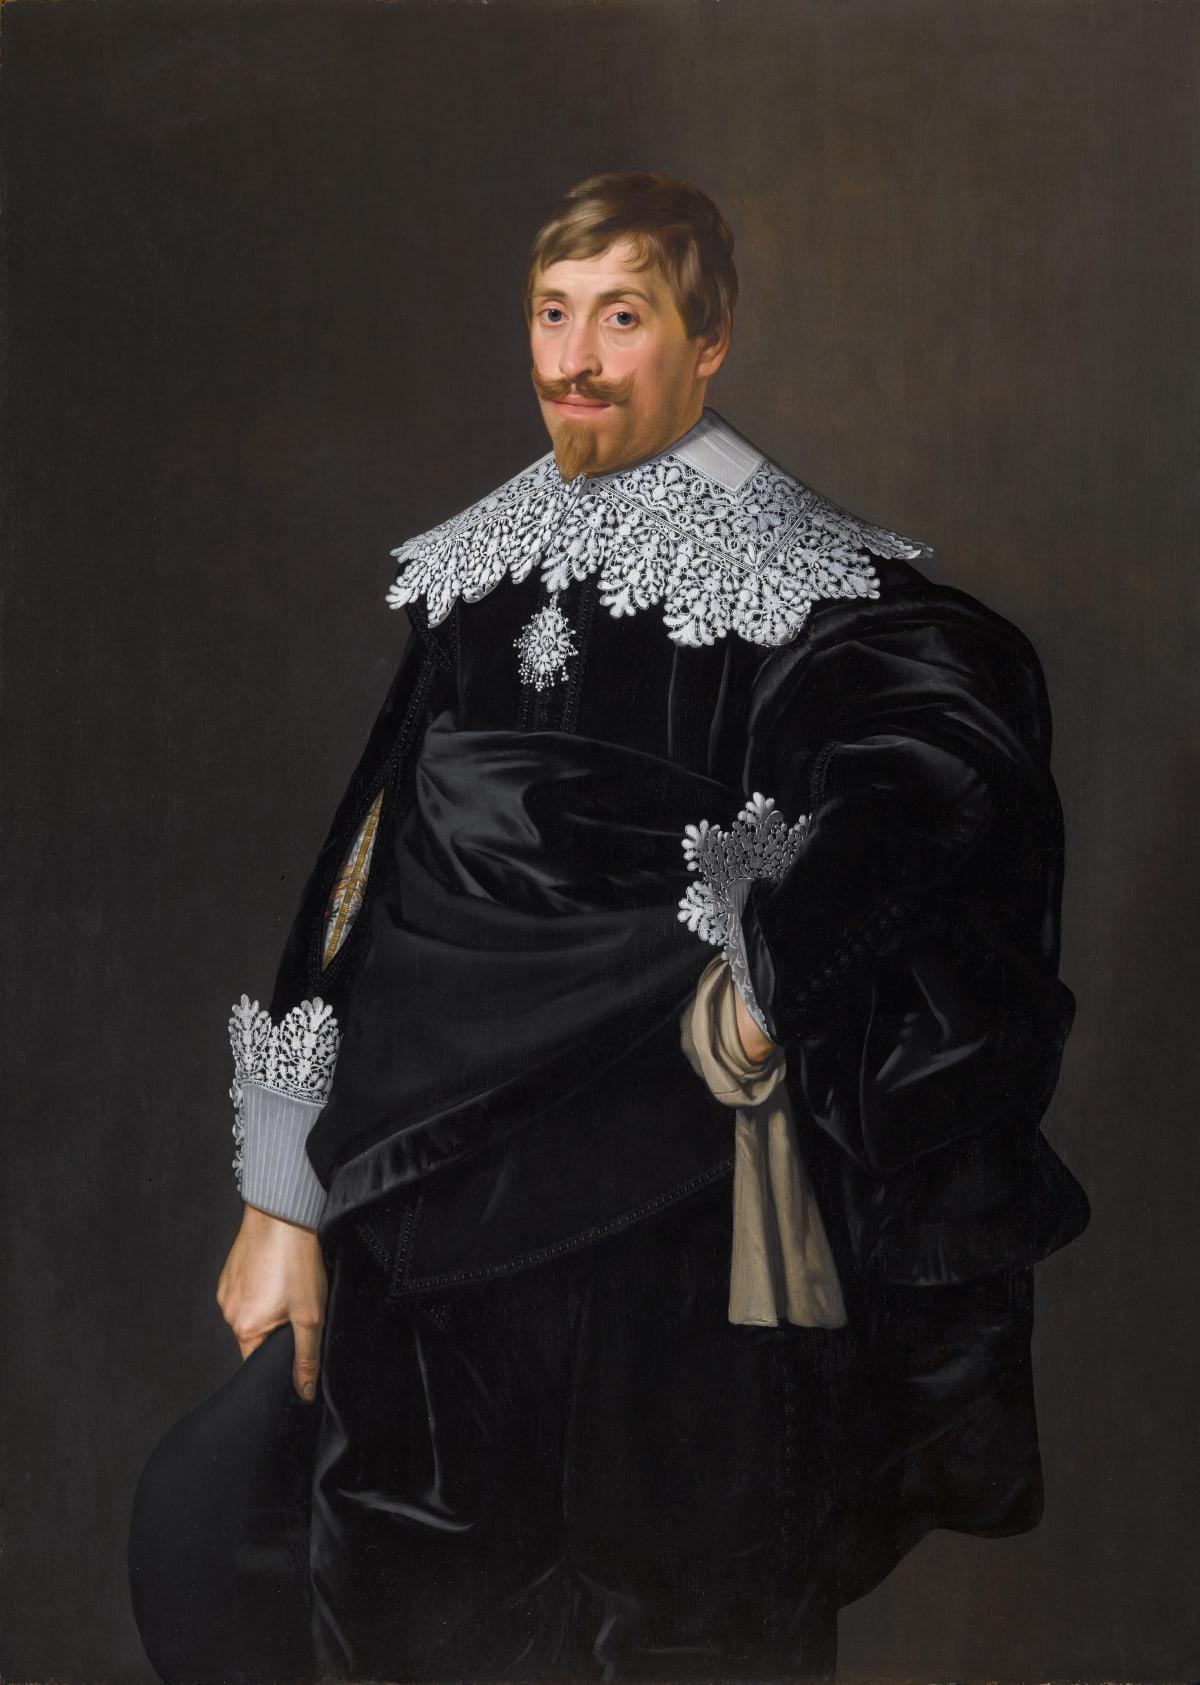 Nicolaes Eliasz Pickenoy (1588 – 1650/56) Frederik Dircksz. van Alewijn (1603 – 1665), c.1632 - 1637 Oil on panel 51 1/8 x 36 1/4 in. (129.9 x 92 cm.)